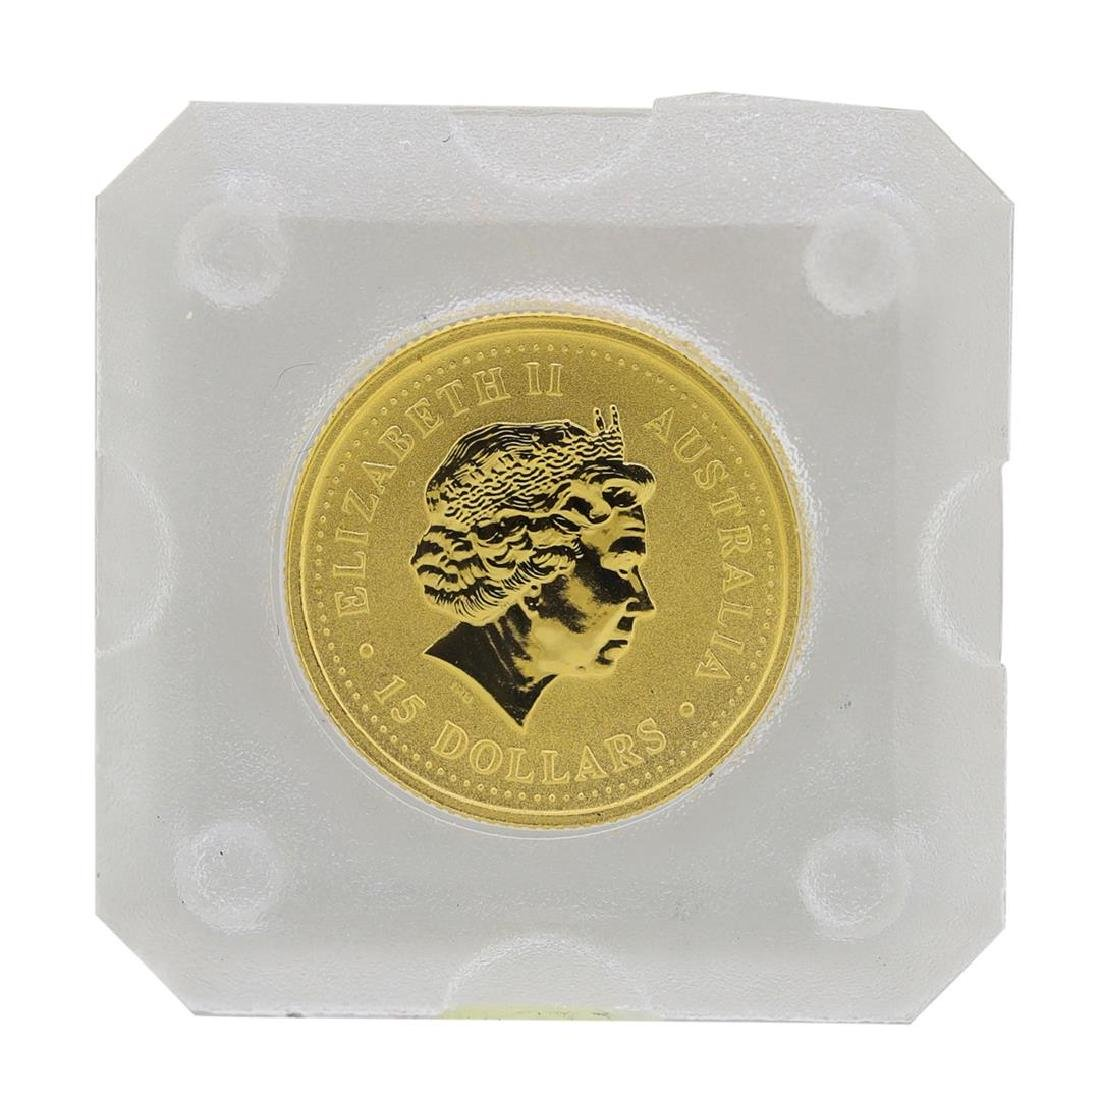 1999 $15 Australia 1/10 oz. Gold Nugget Coin - 2